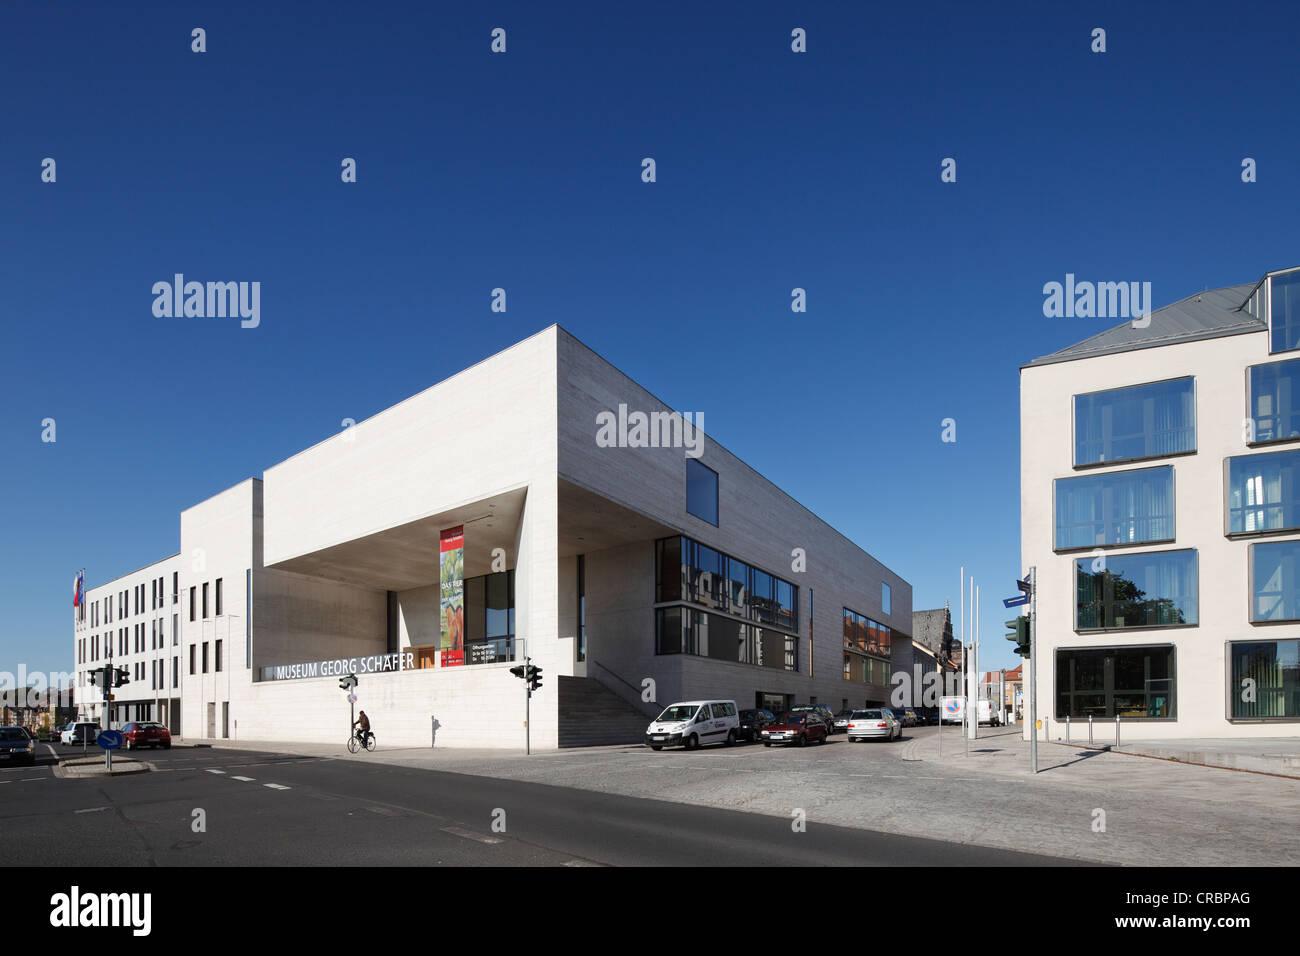 Georg Schaefer Museum, Schweinfurt, Lower Franconia, Franconia, Bavaria, Germany, Europe, PublicGround Stock Photo